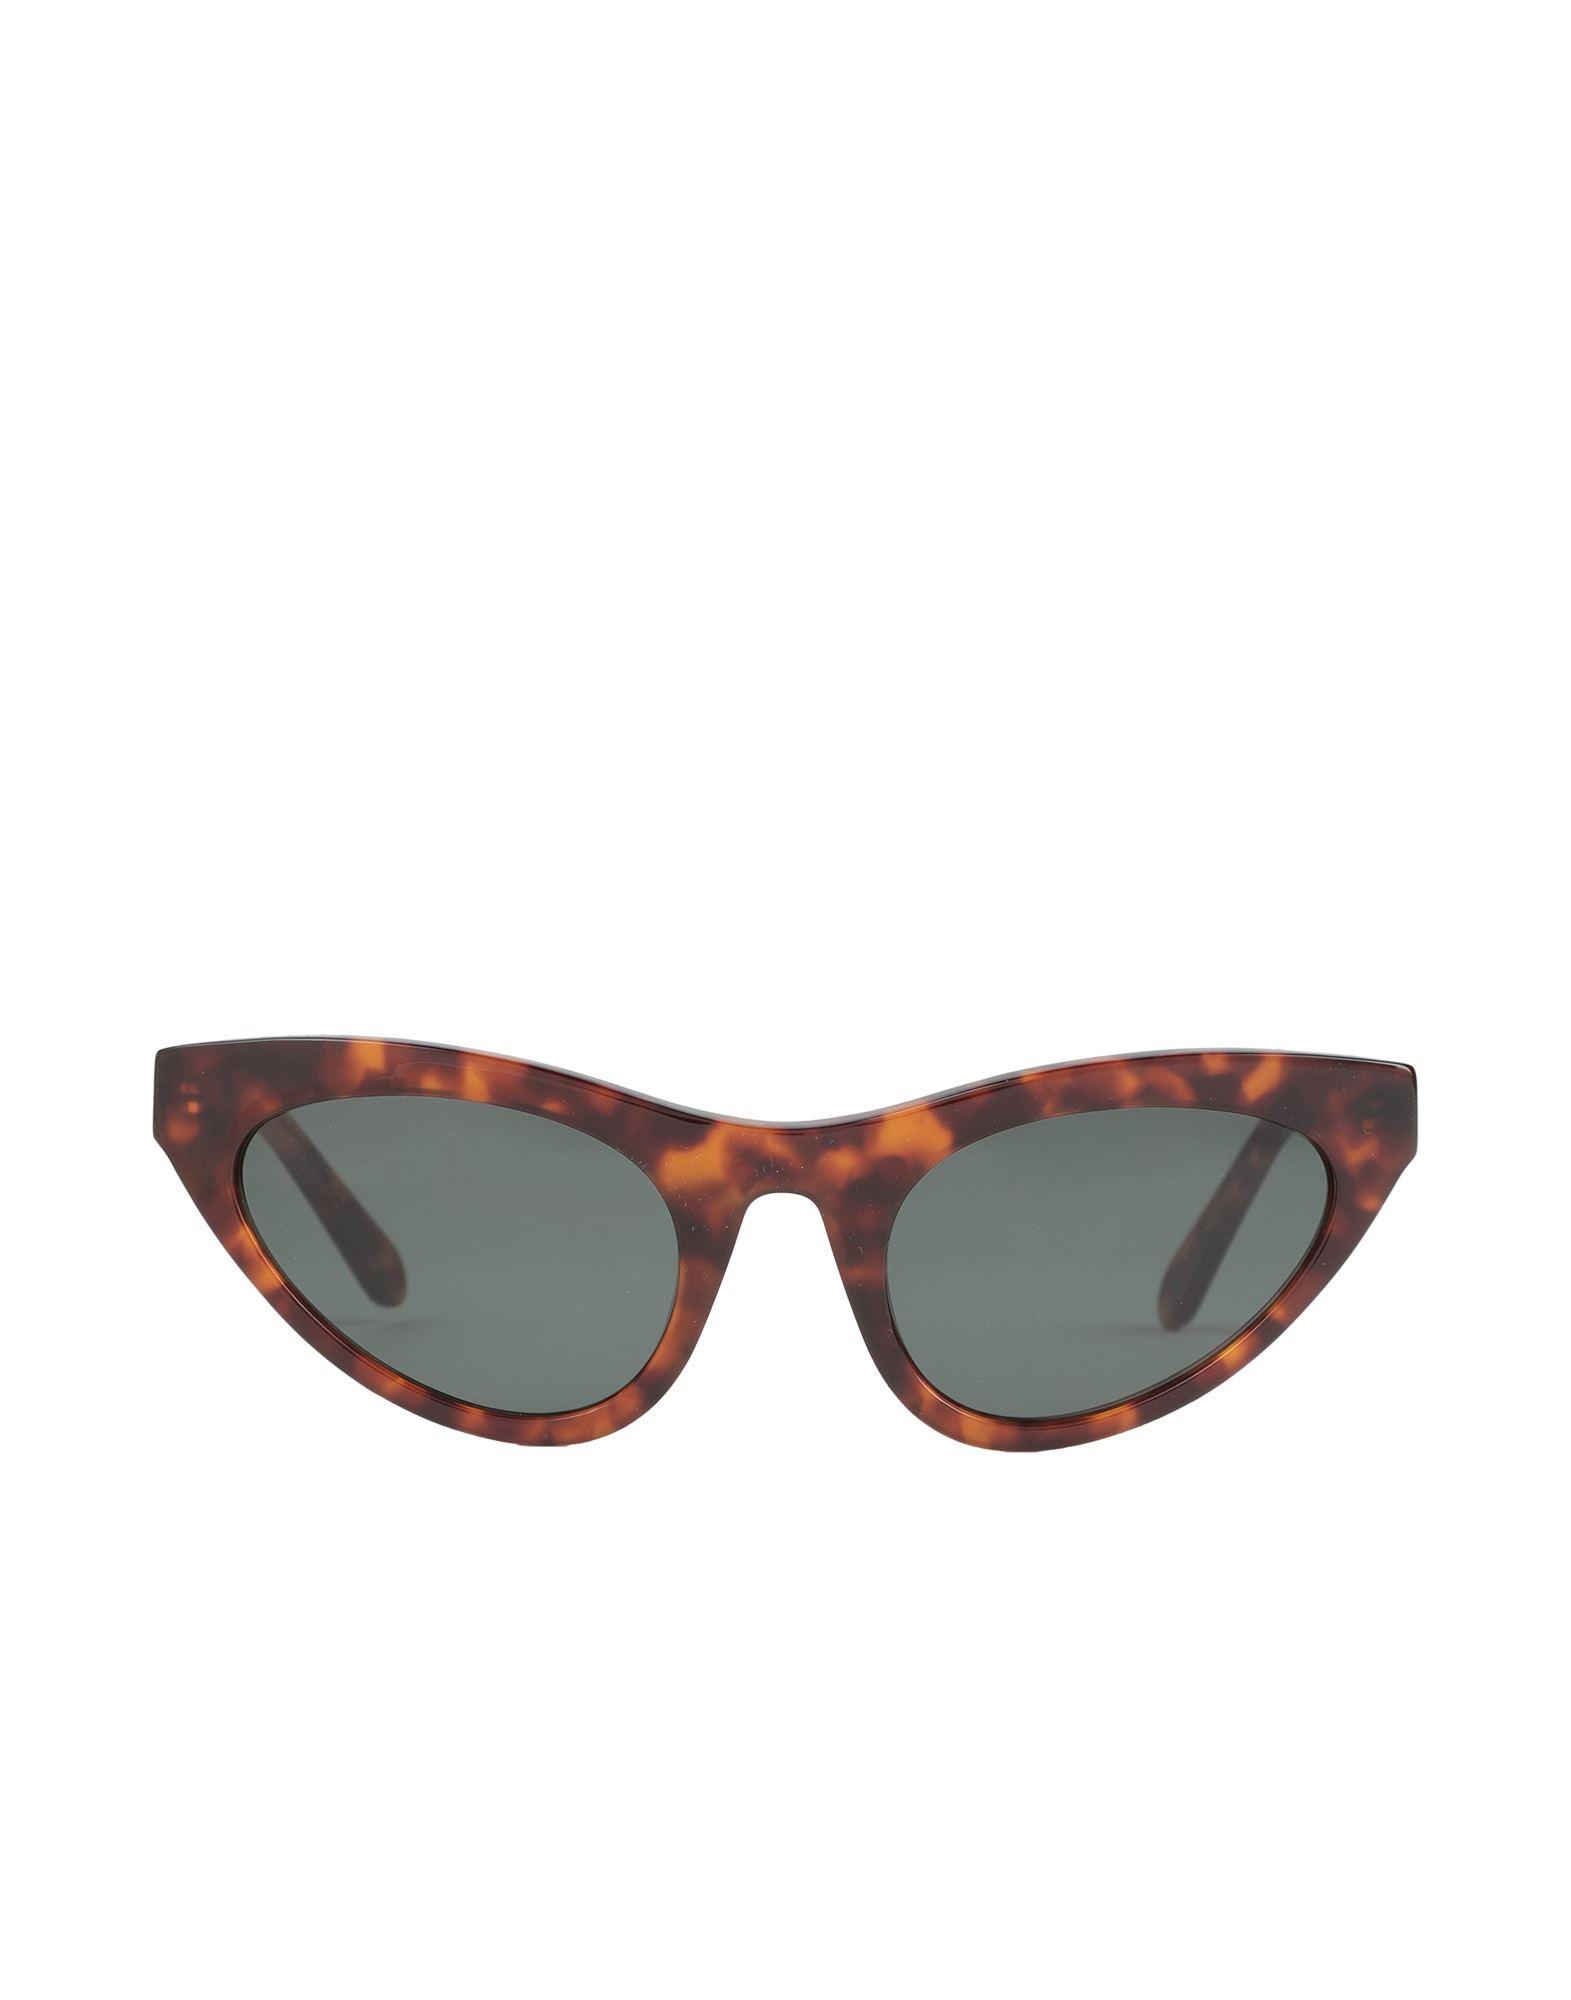 HAN KJØBENHAVN Sunglasses - Item 46737535